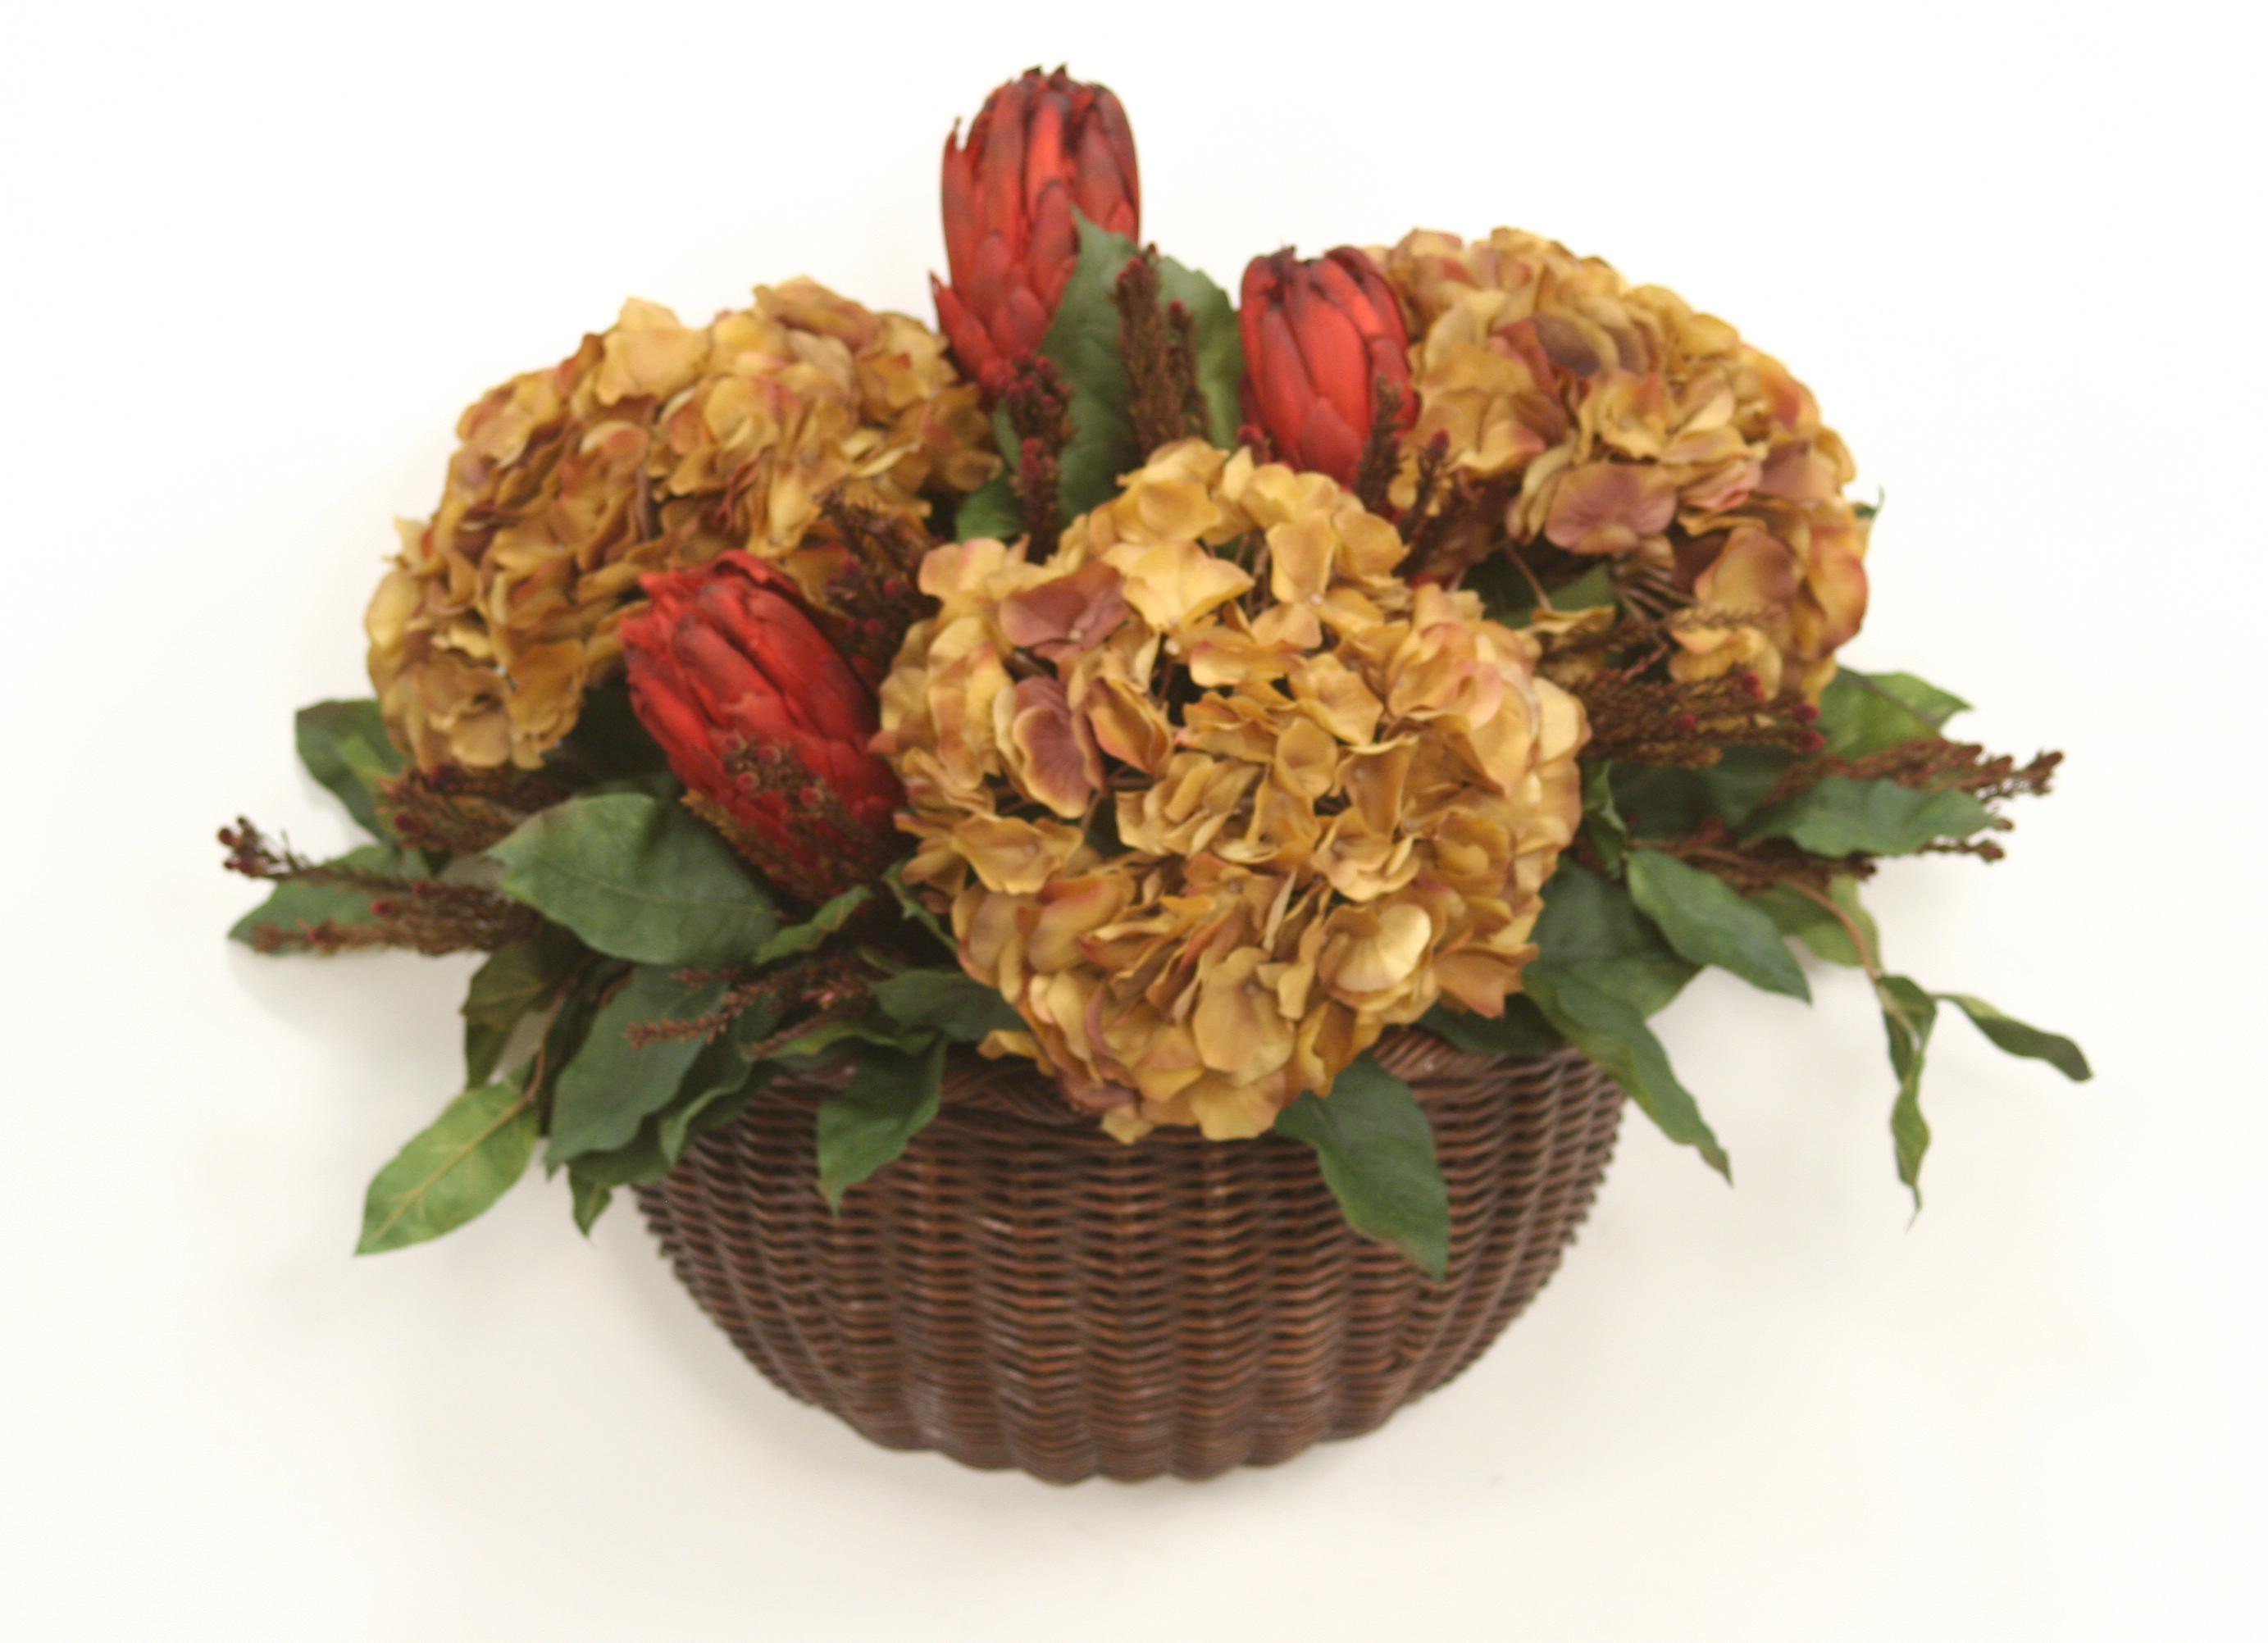 Flower Baskets Usa : Silk burgundy brown hydrangeas and foliage mix in wicker